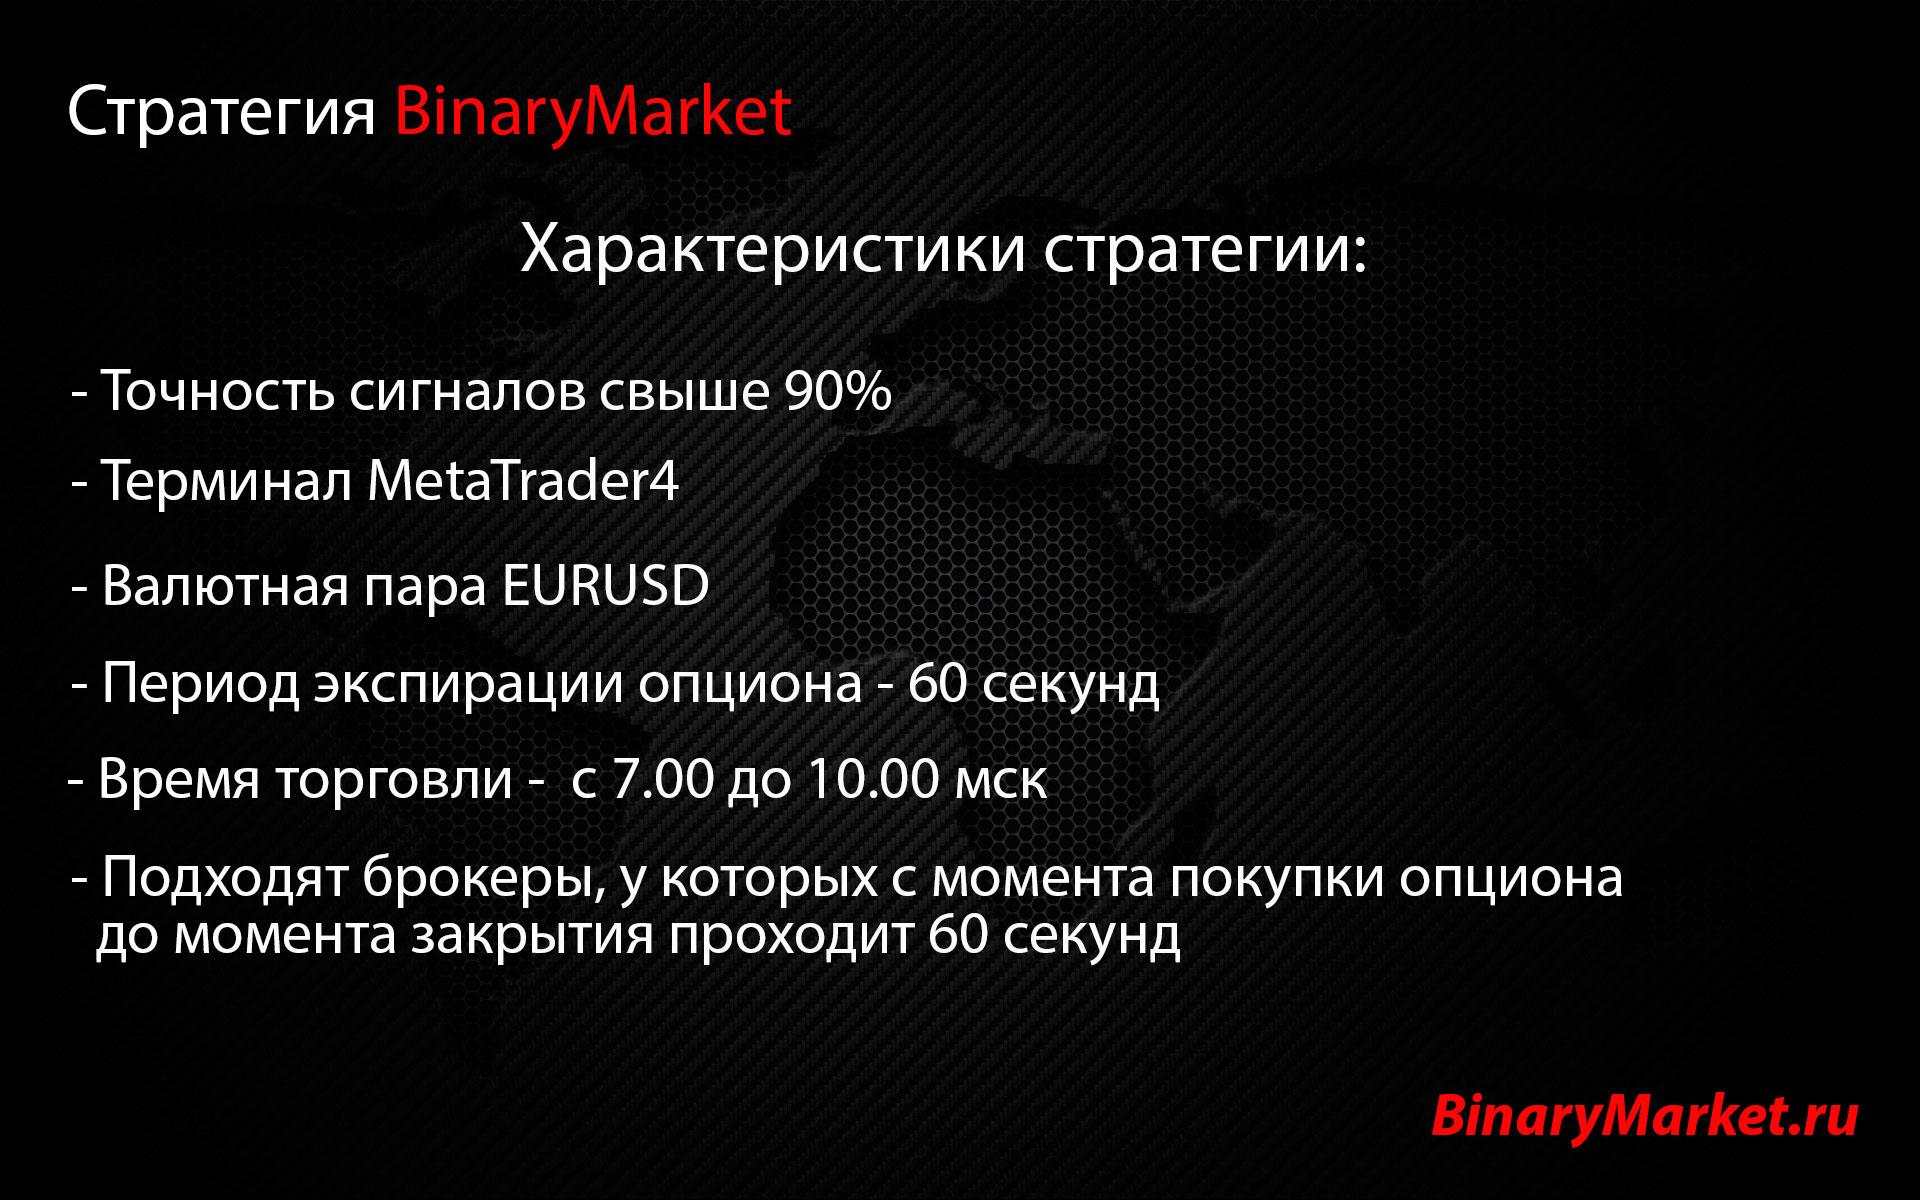 Характеристики стратегии BinaryMarket